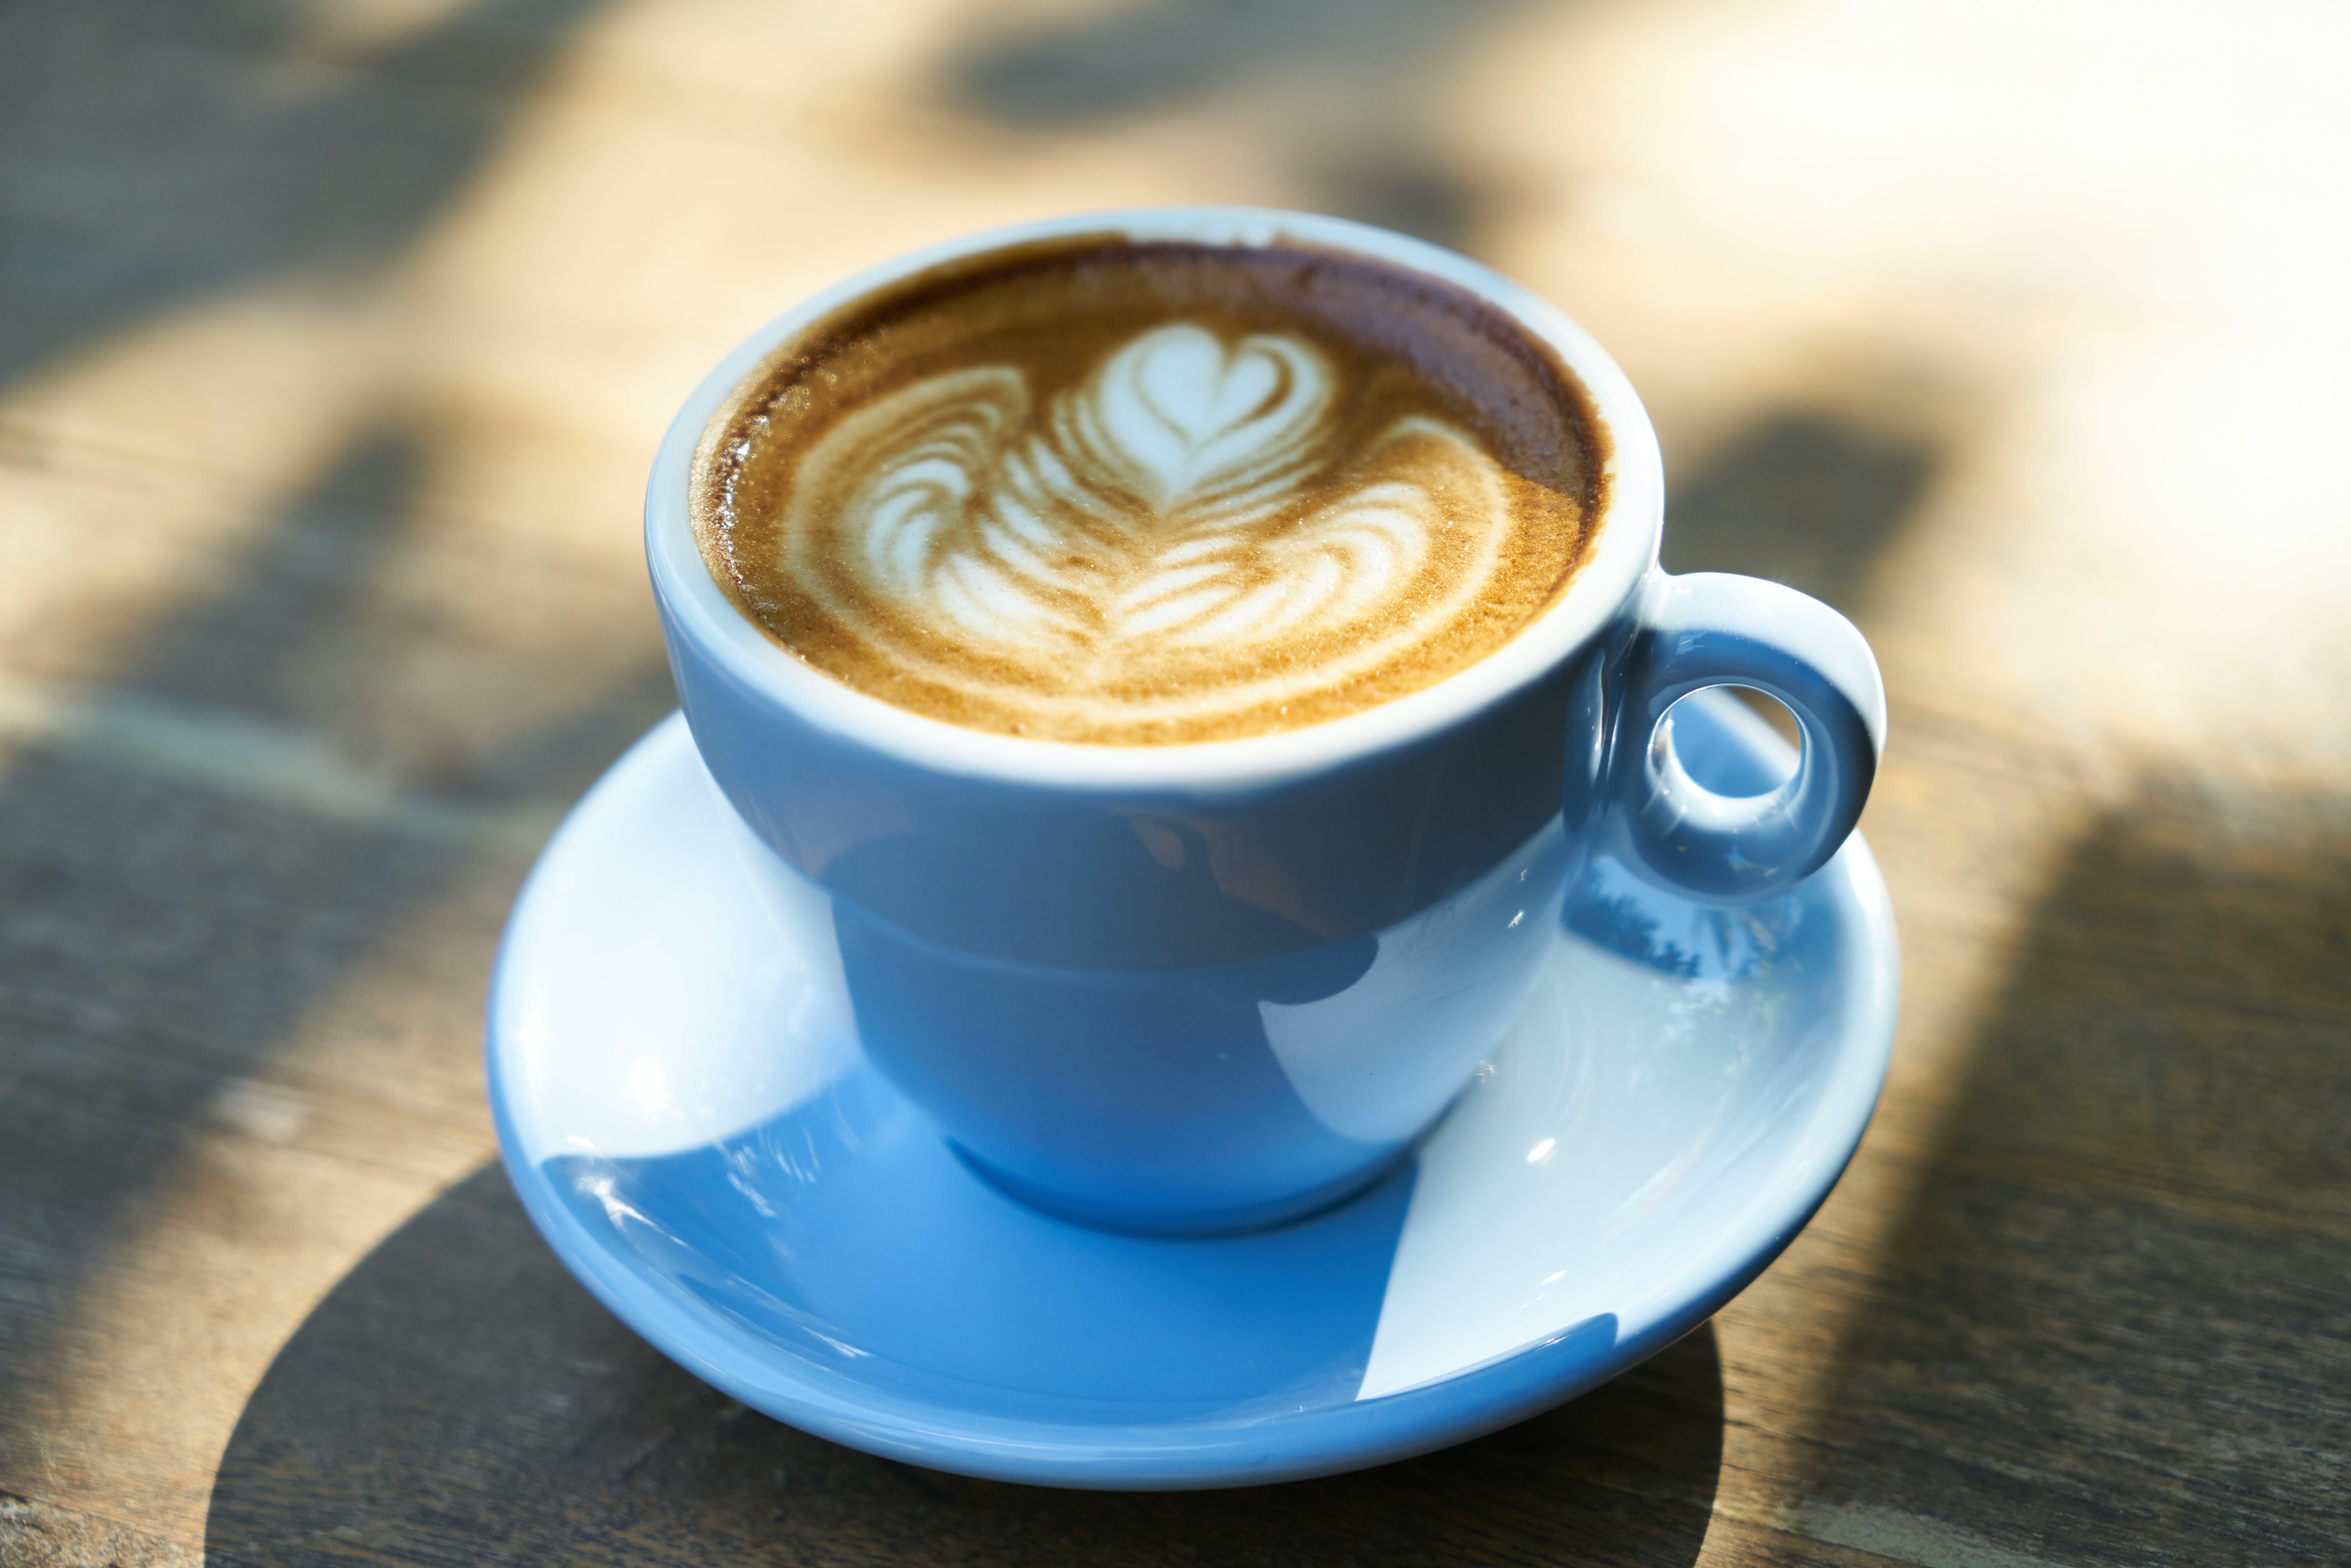 beverage, blue, breakfast